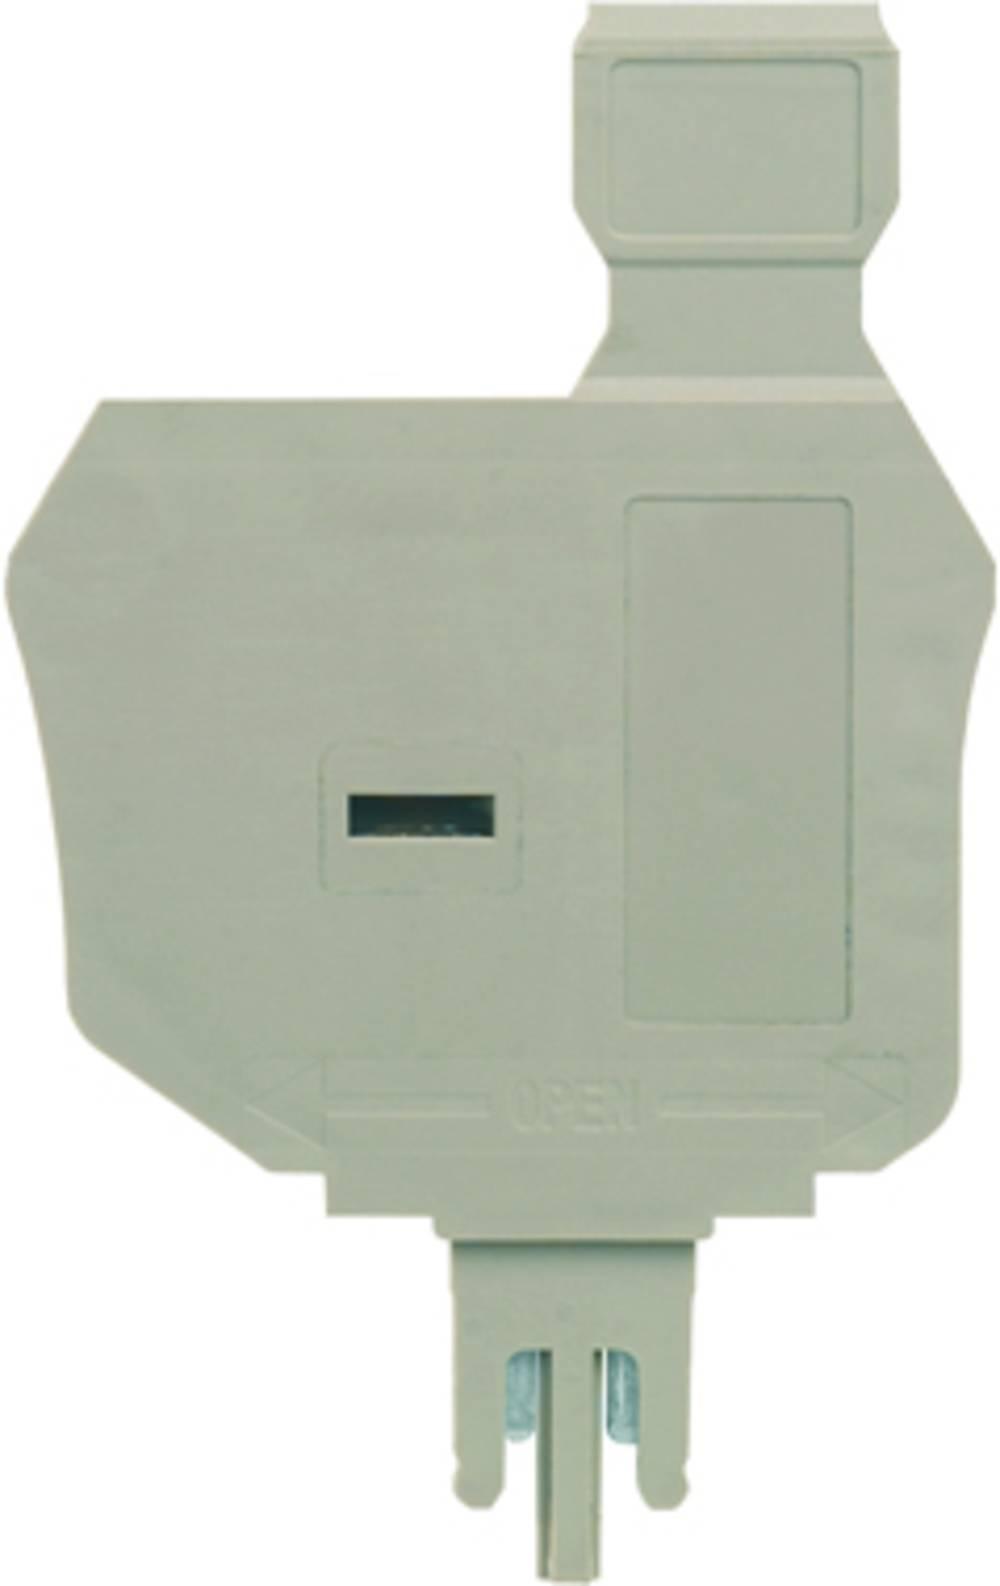 sikringsholder SIHA 2/G20 140-250V 9537640000 Weidmüller 25 stk